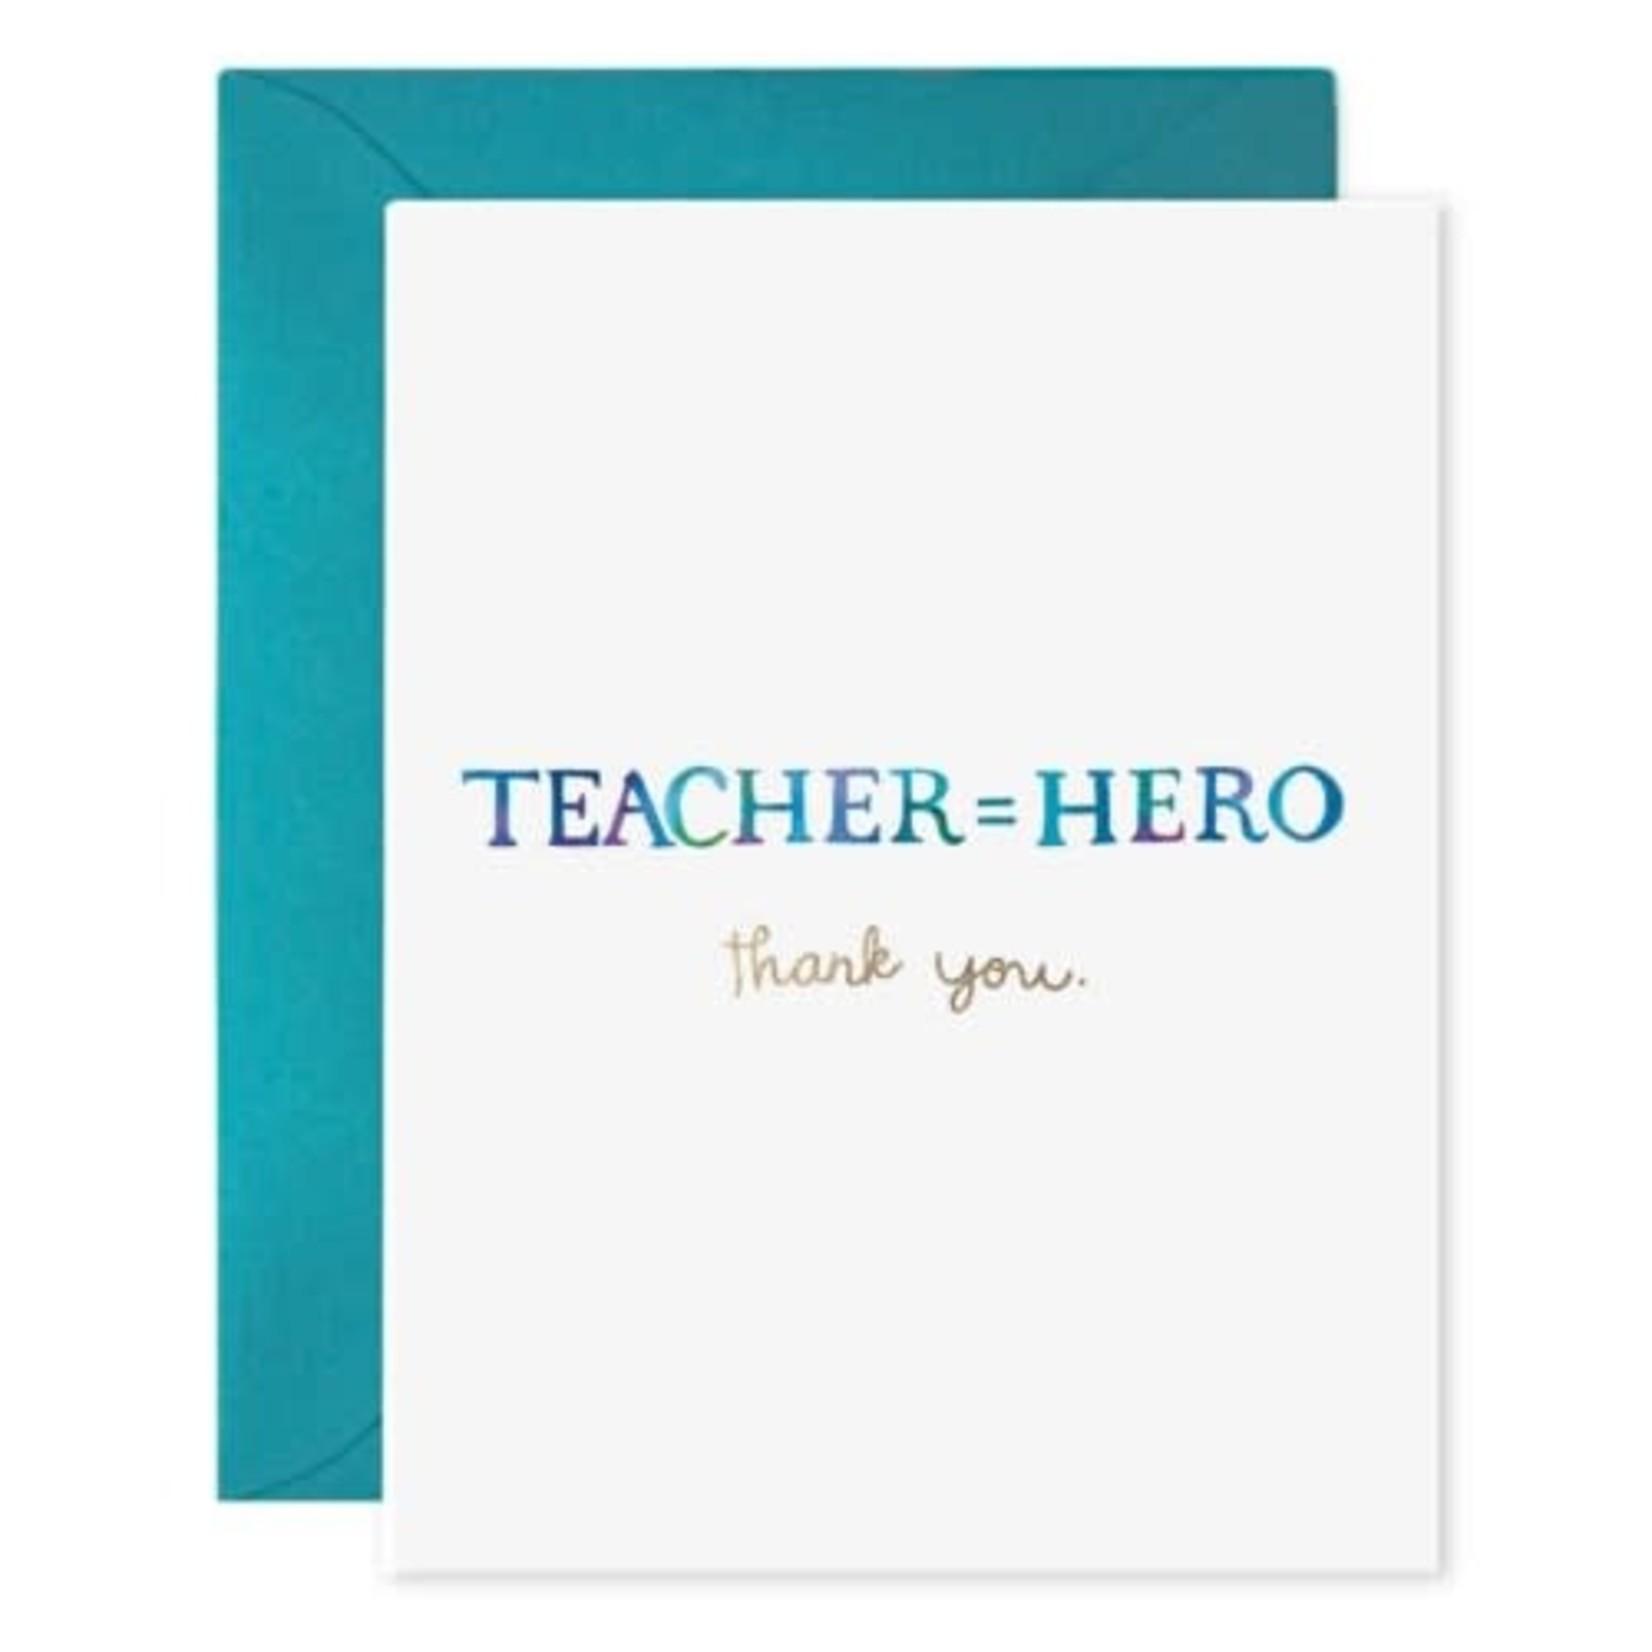 TEACHER = HERO CARD